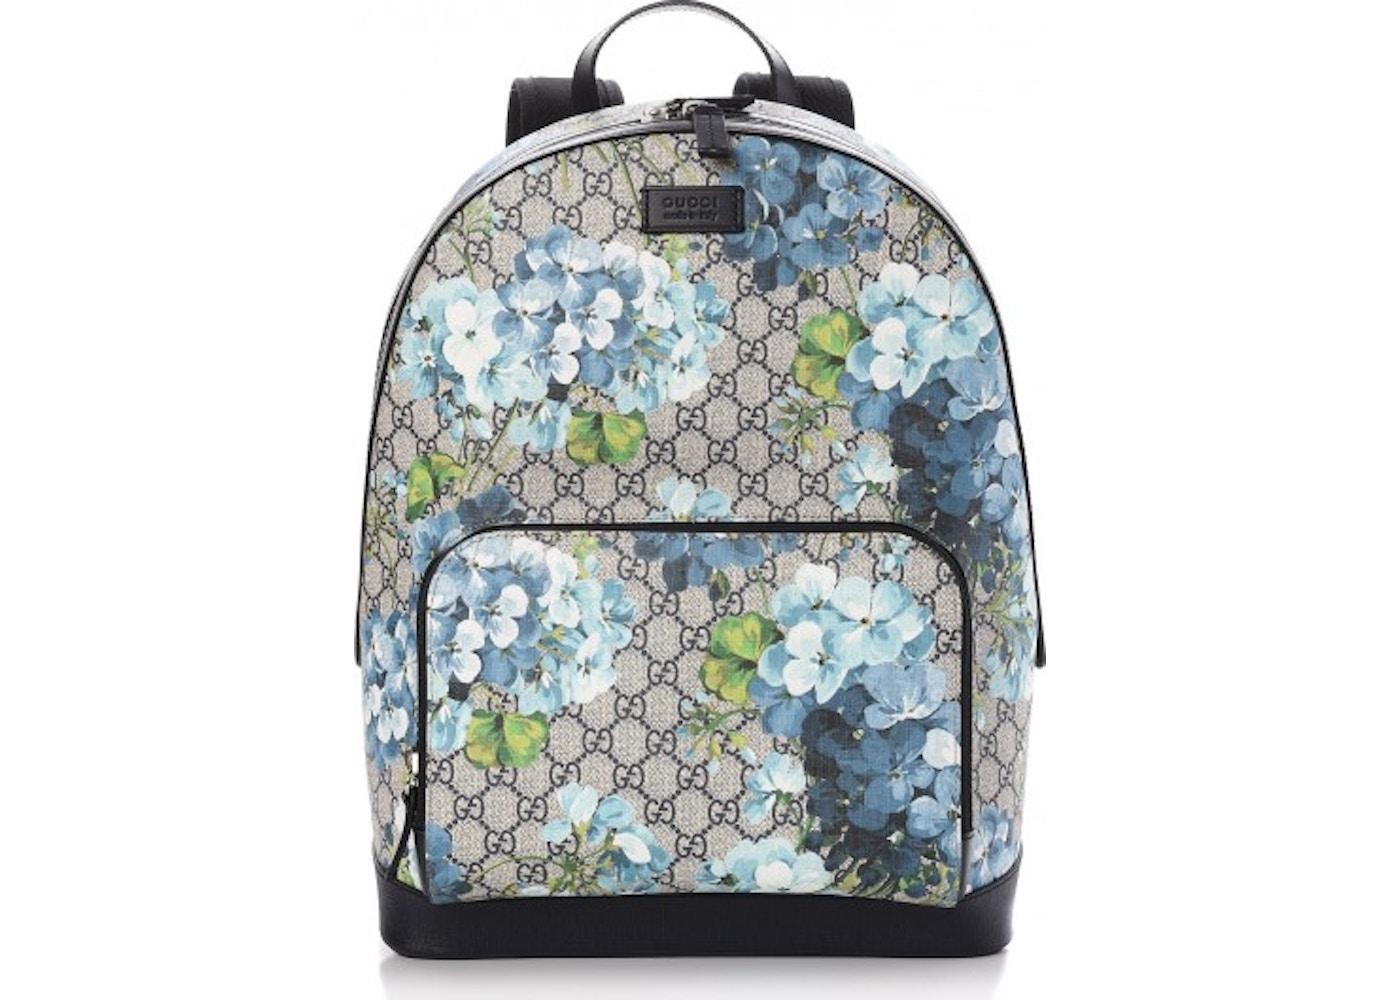 e71f513d0aed Gucci Backpack Monogram GG Supreme Blooms Print Medium Blue